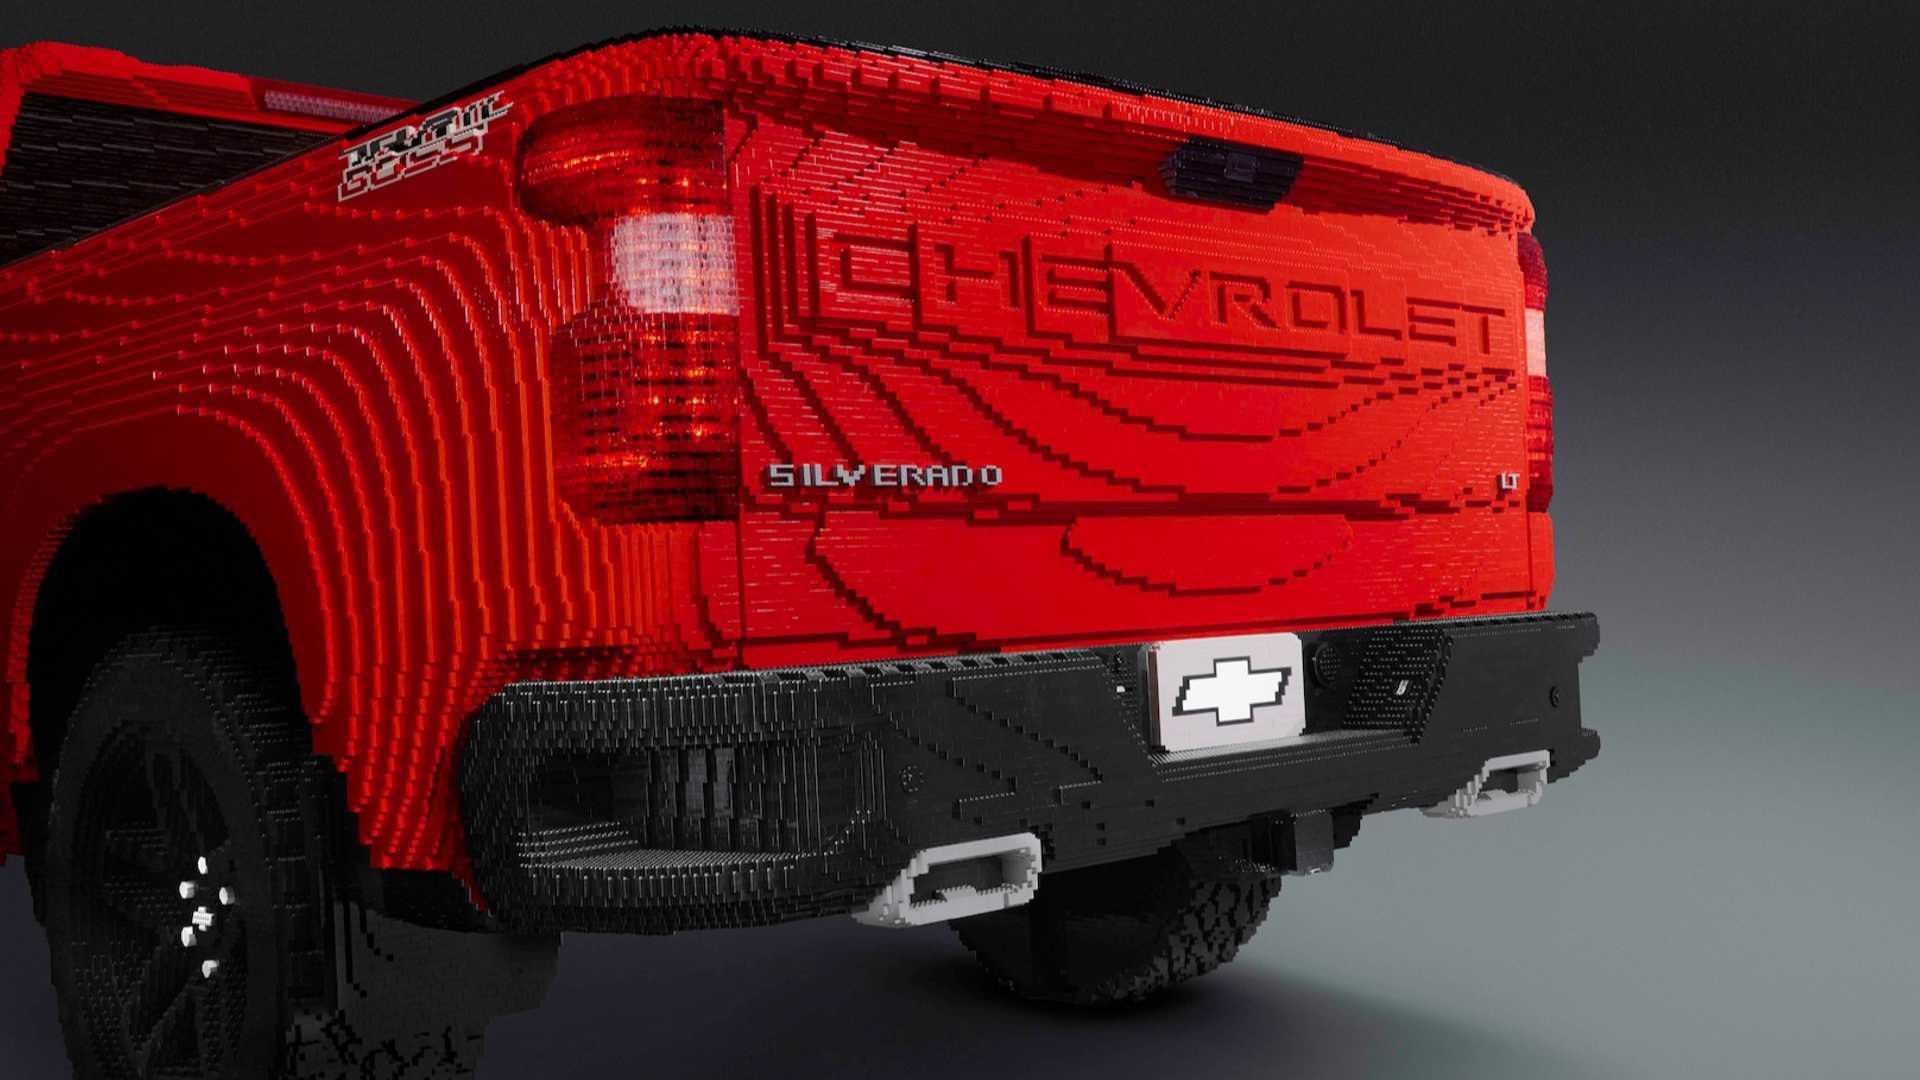 Chevrolet Builds Life-Sized LEGO Silverado - GM Inside News